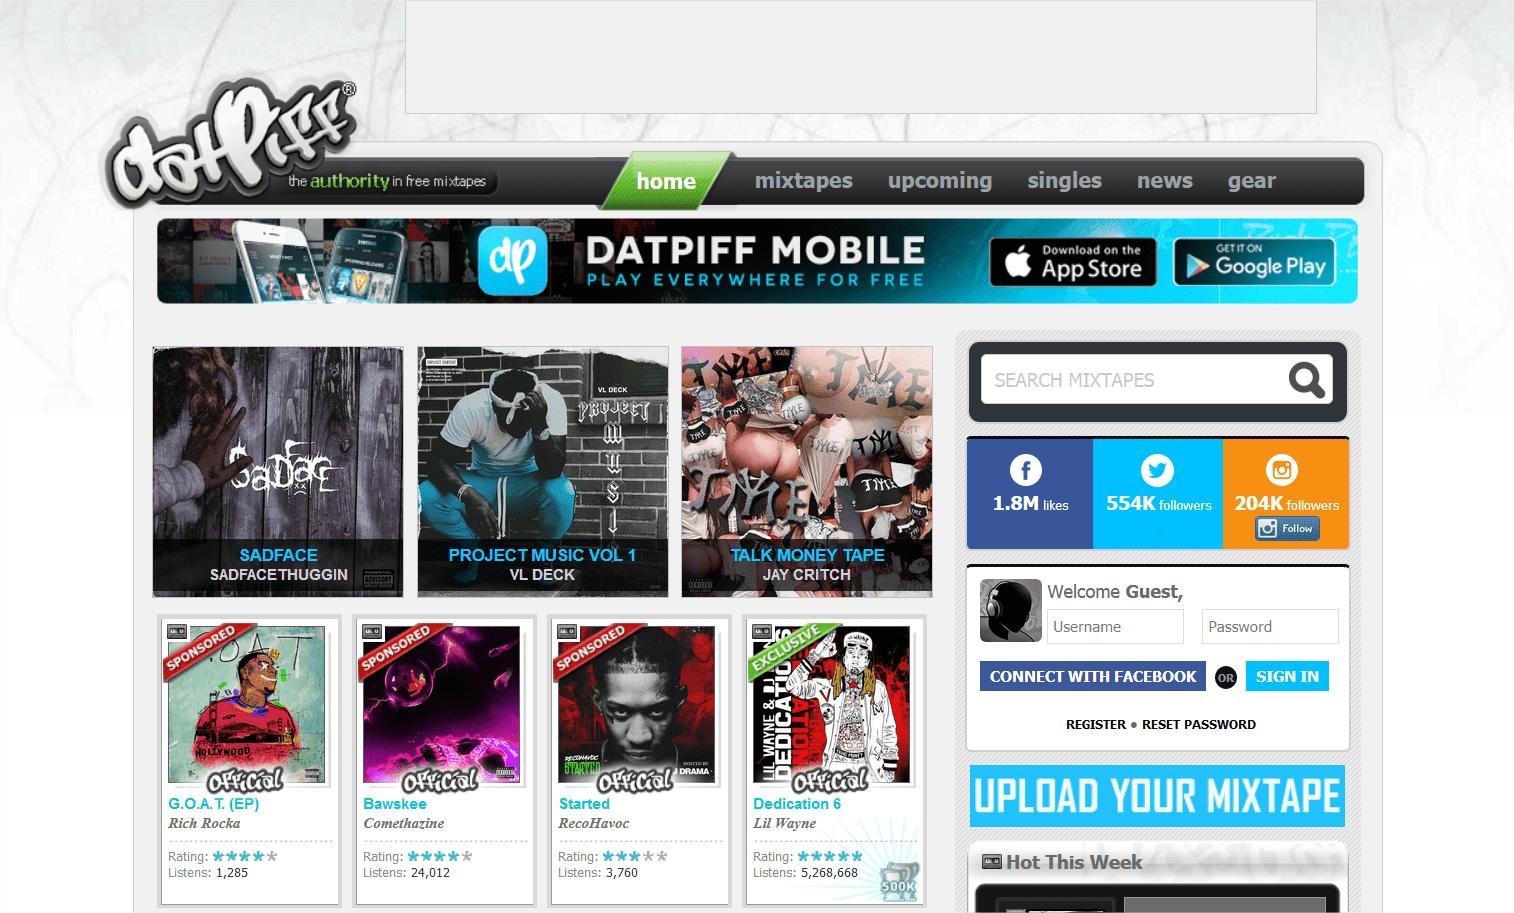 Descubra 25 sites para download de musica gratis legalmente 13